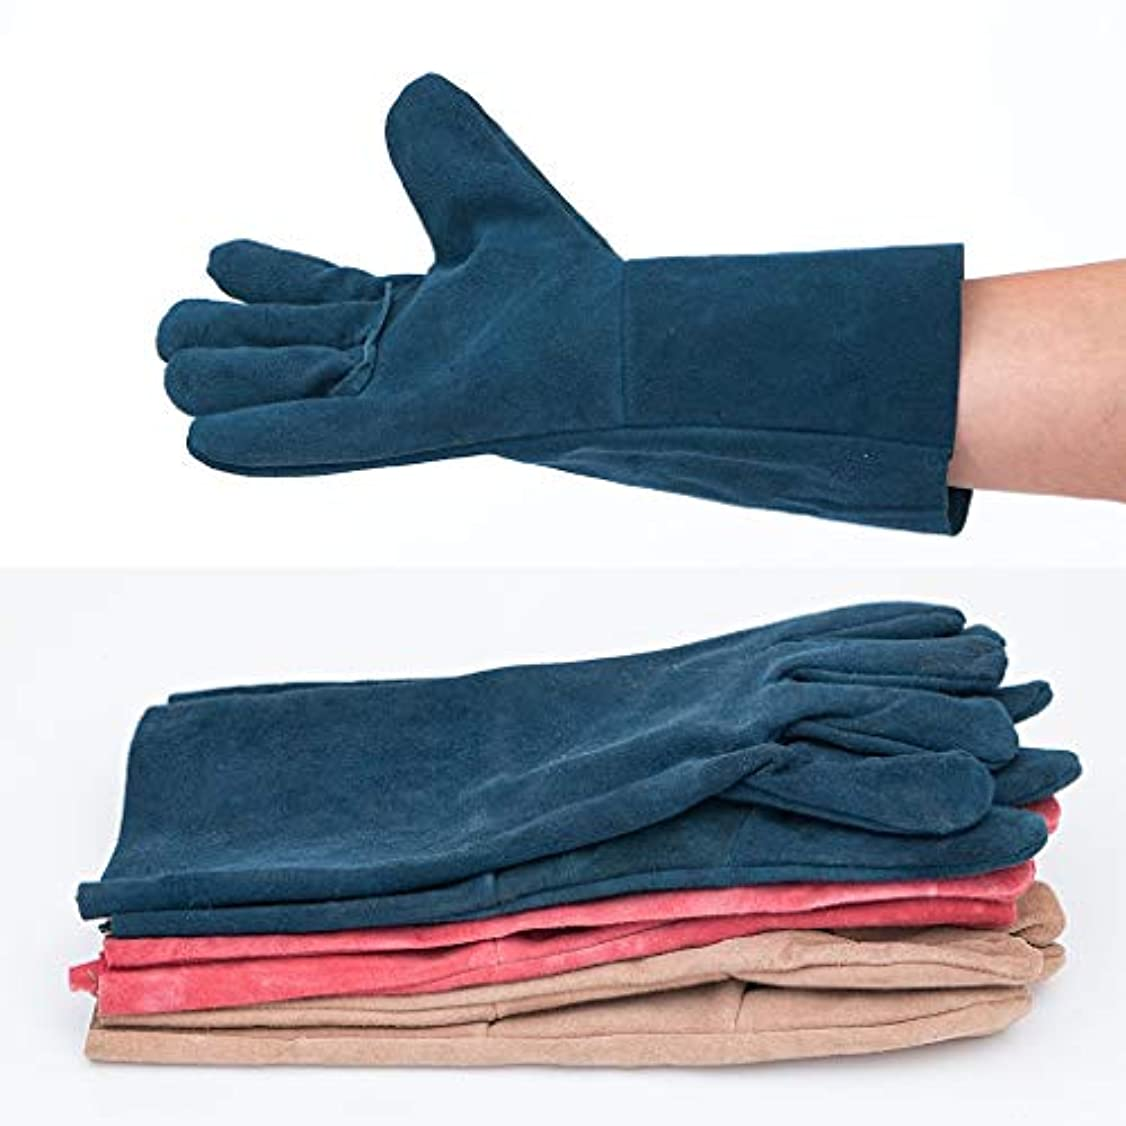 TIG溶接機保護手袋および長革手袋、耐摩耗性絶縁およびやけ防止、33 cm、10ペア、ランダムカラー SHWSM